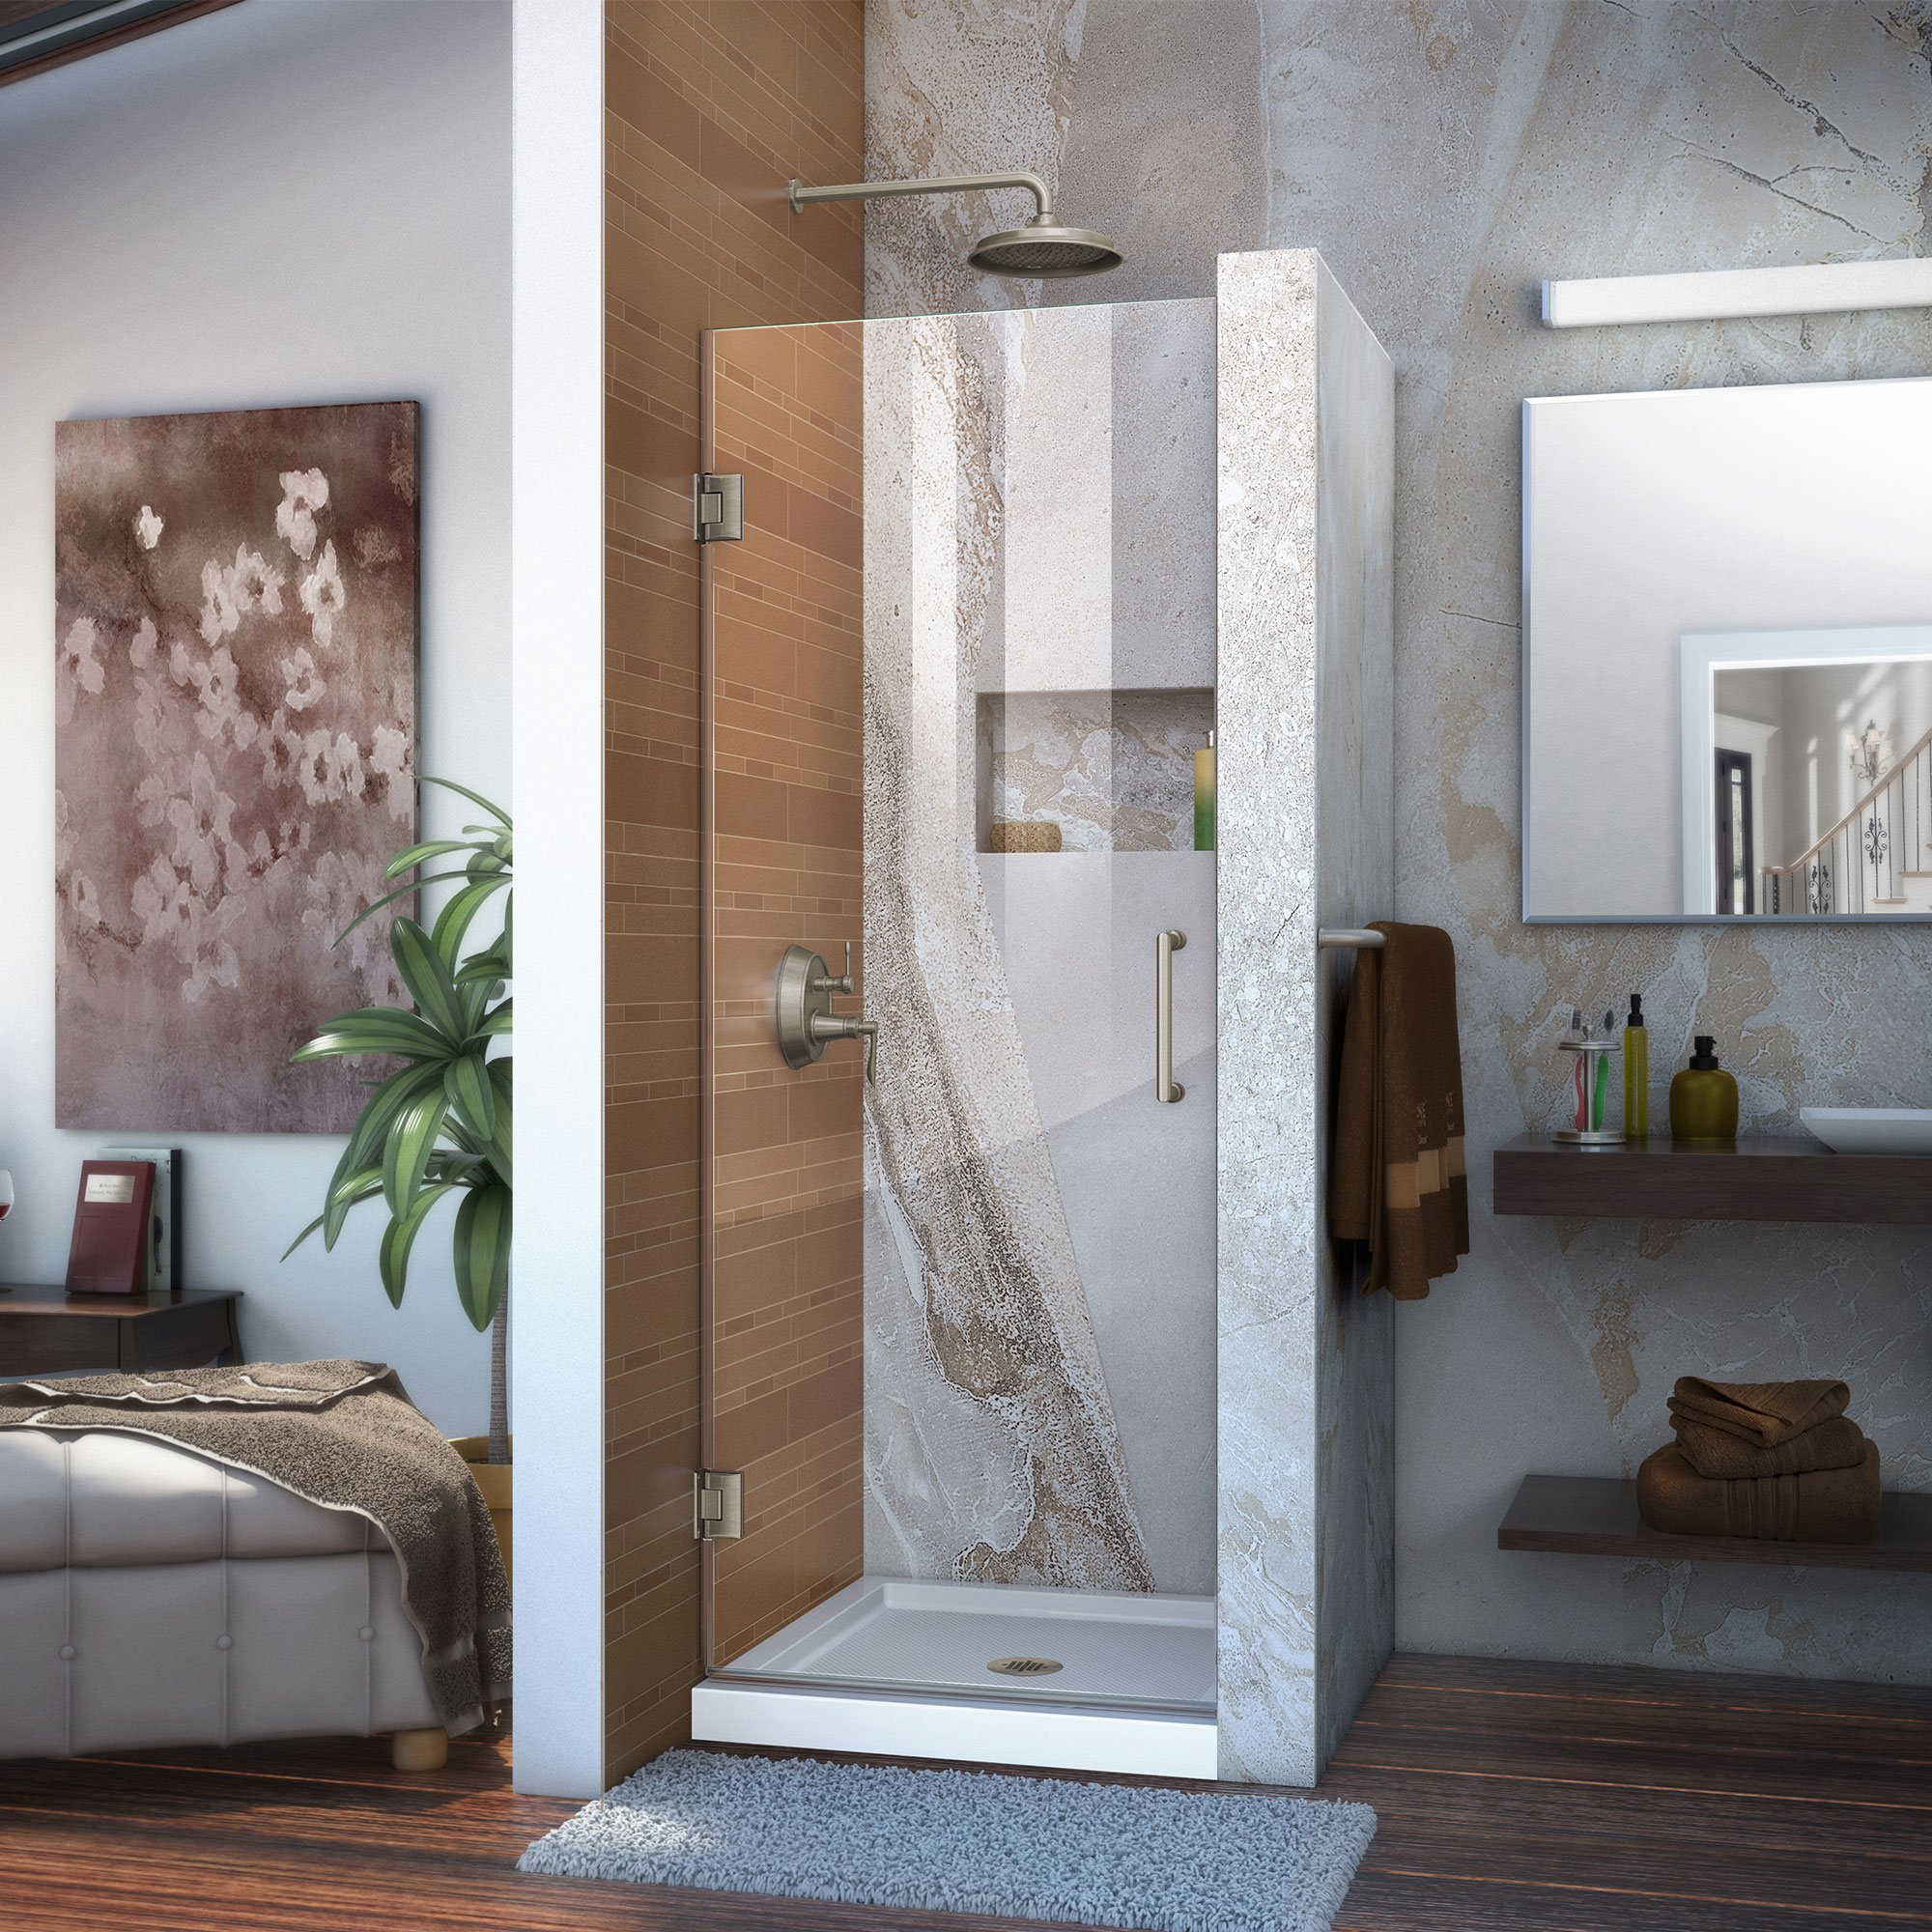 DreamLine Unidoor 28 in. Width, Frameless Hinged Shower Door, 3/8'' Glass, Brushed Nickel Finish by DreamLine